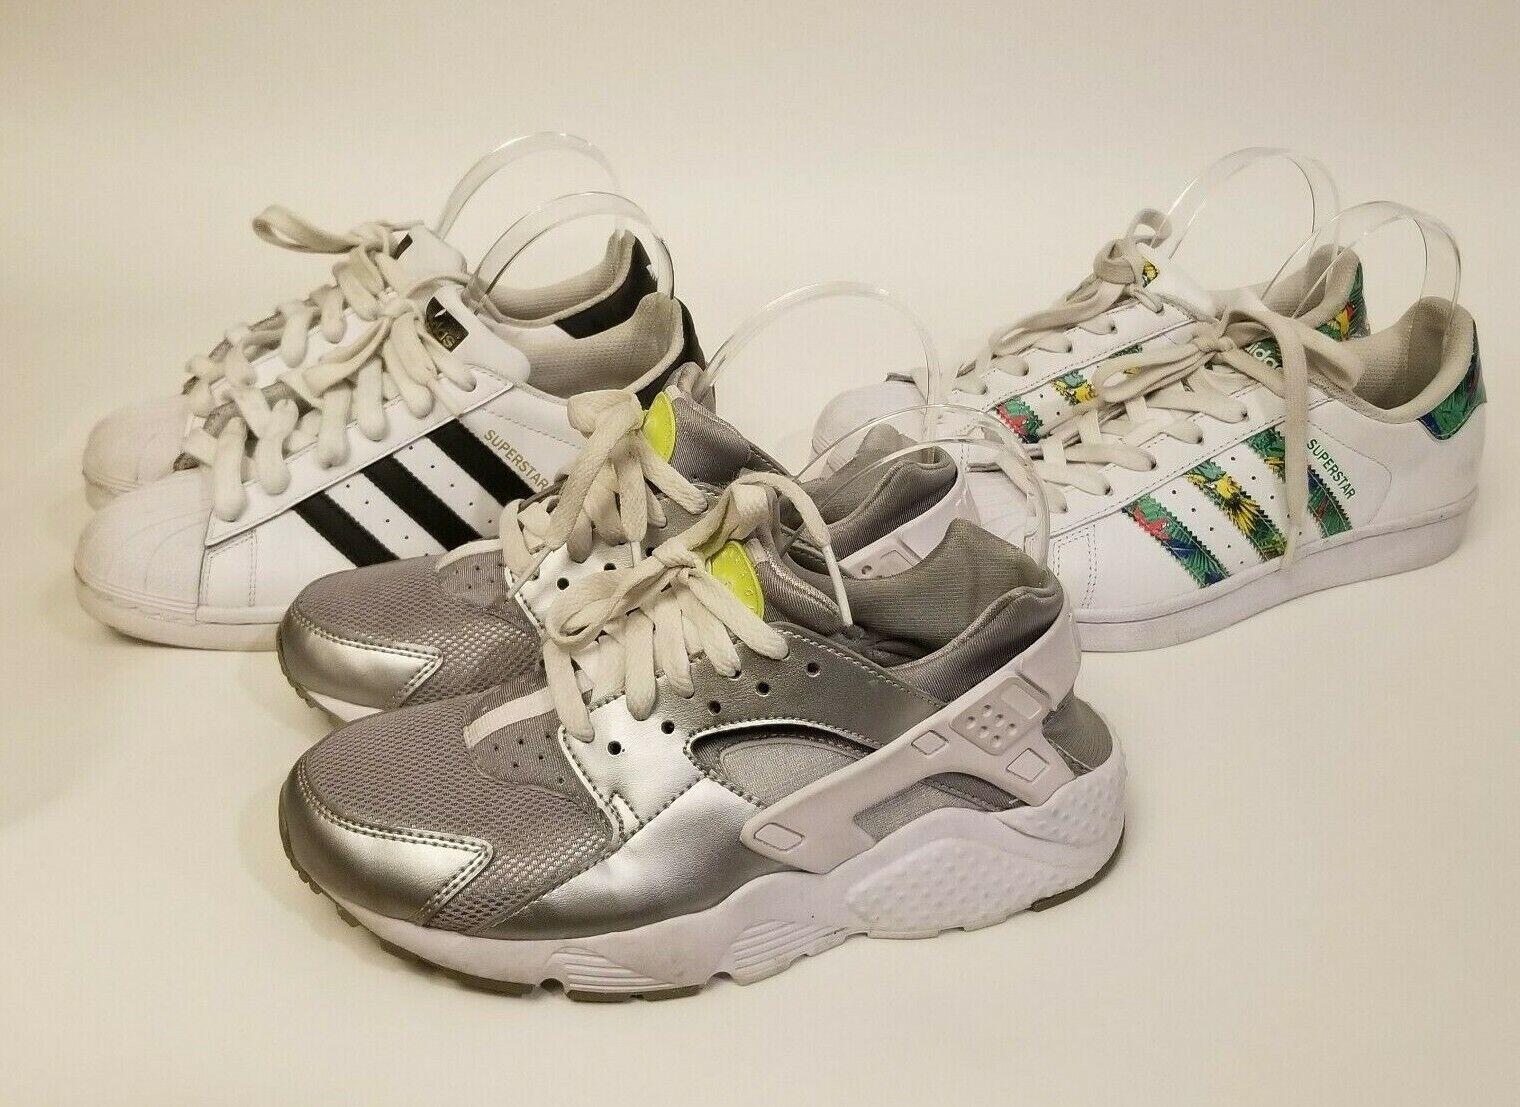 Silber Huarache Nike Hawaii Original Superstar kinder Adidas